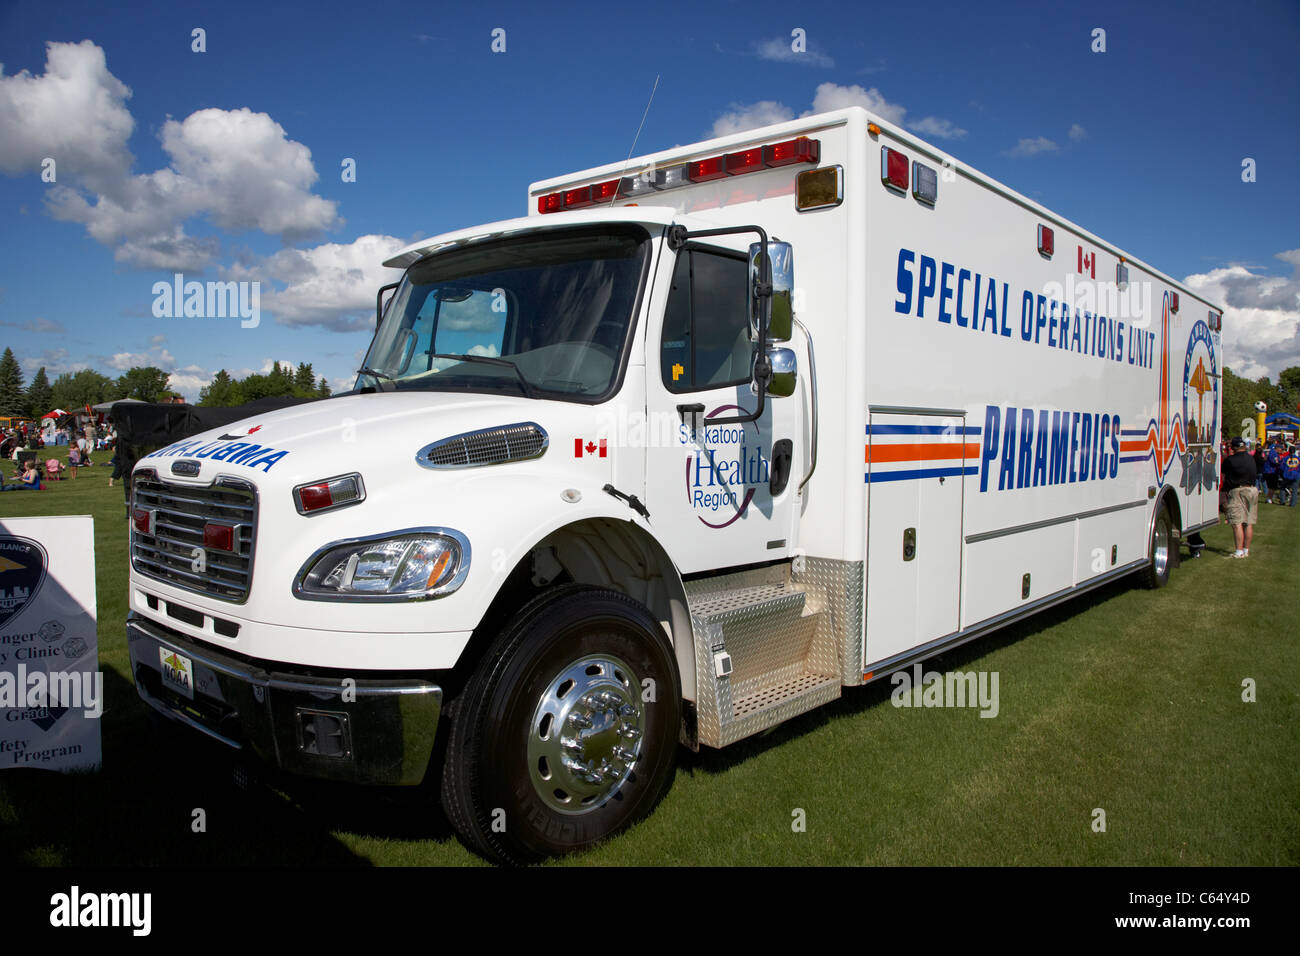 La Saskatoon Health Region unité d'opérations spéciales du Canada Saskatchewan paramédics Photo Stock